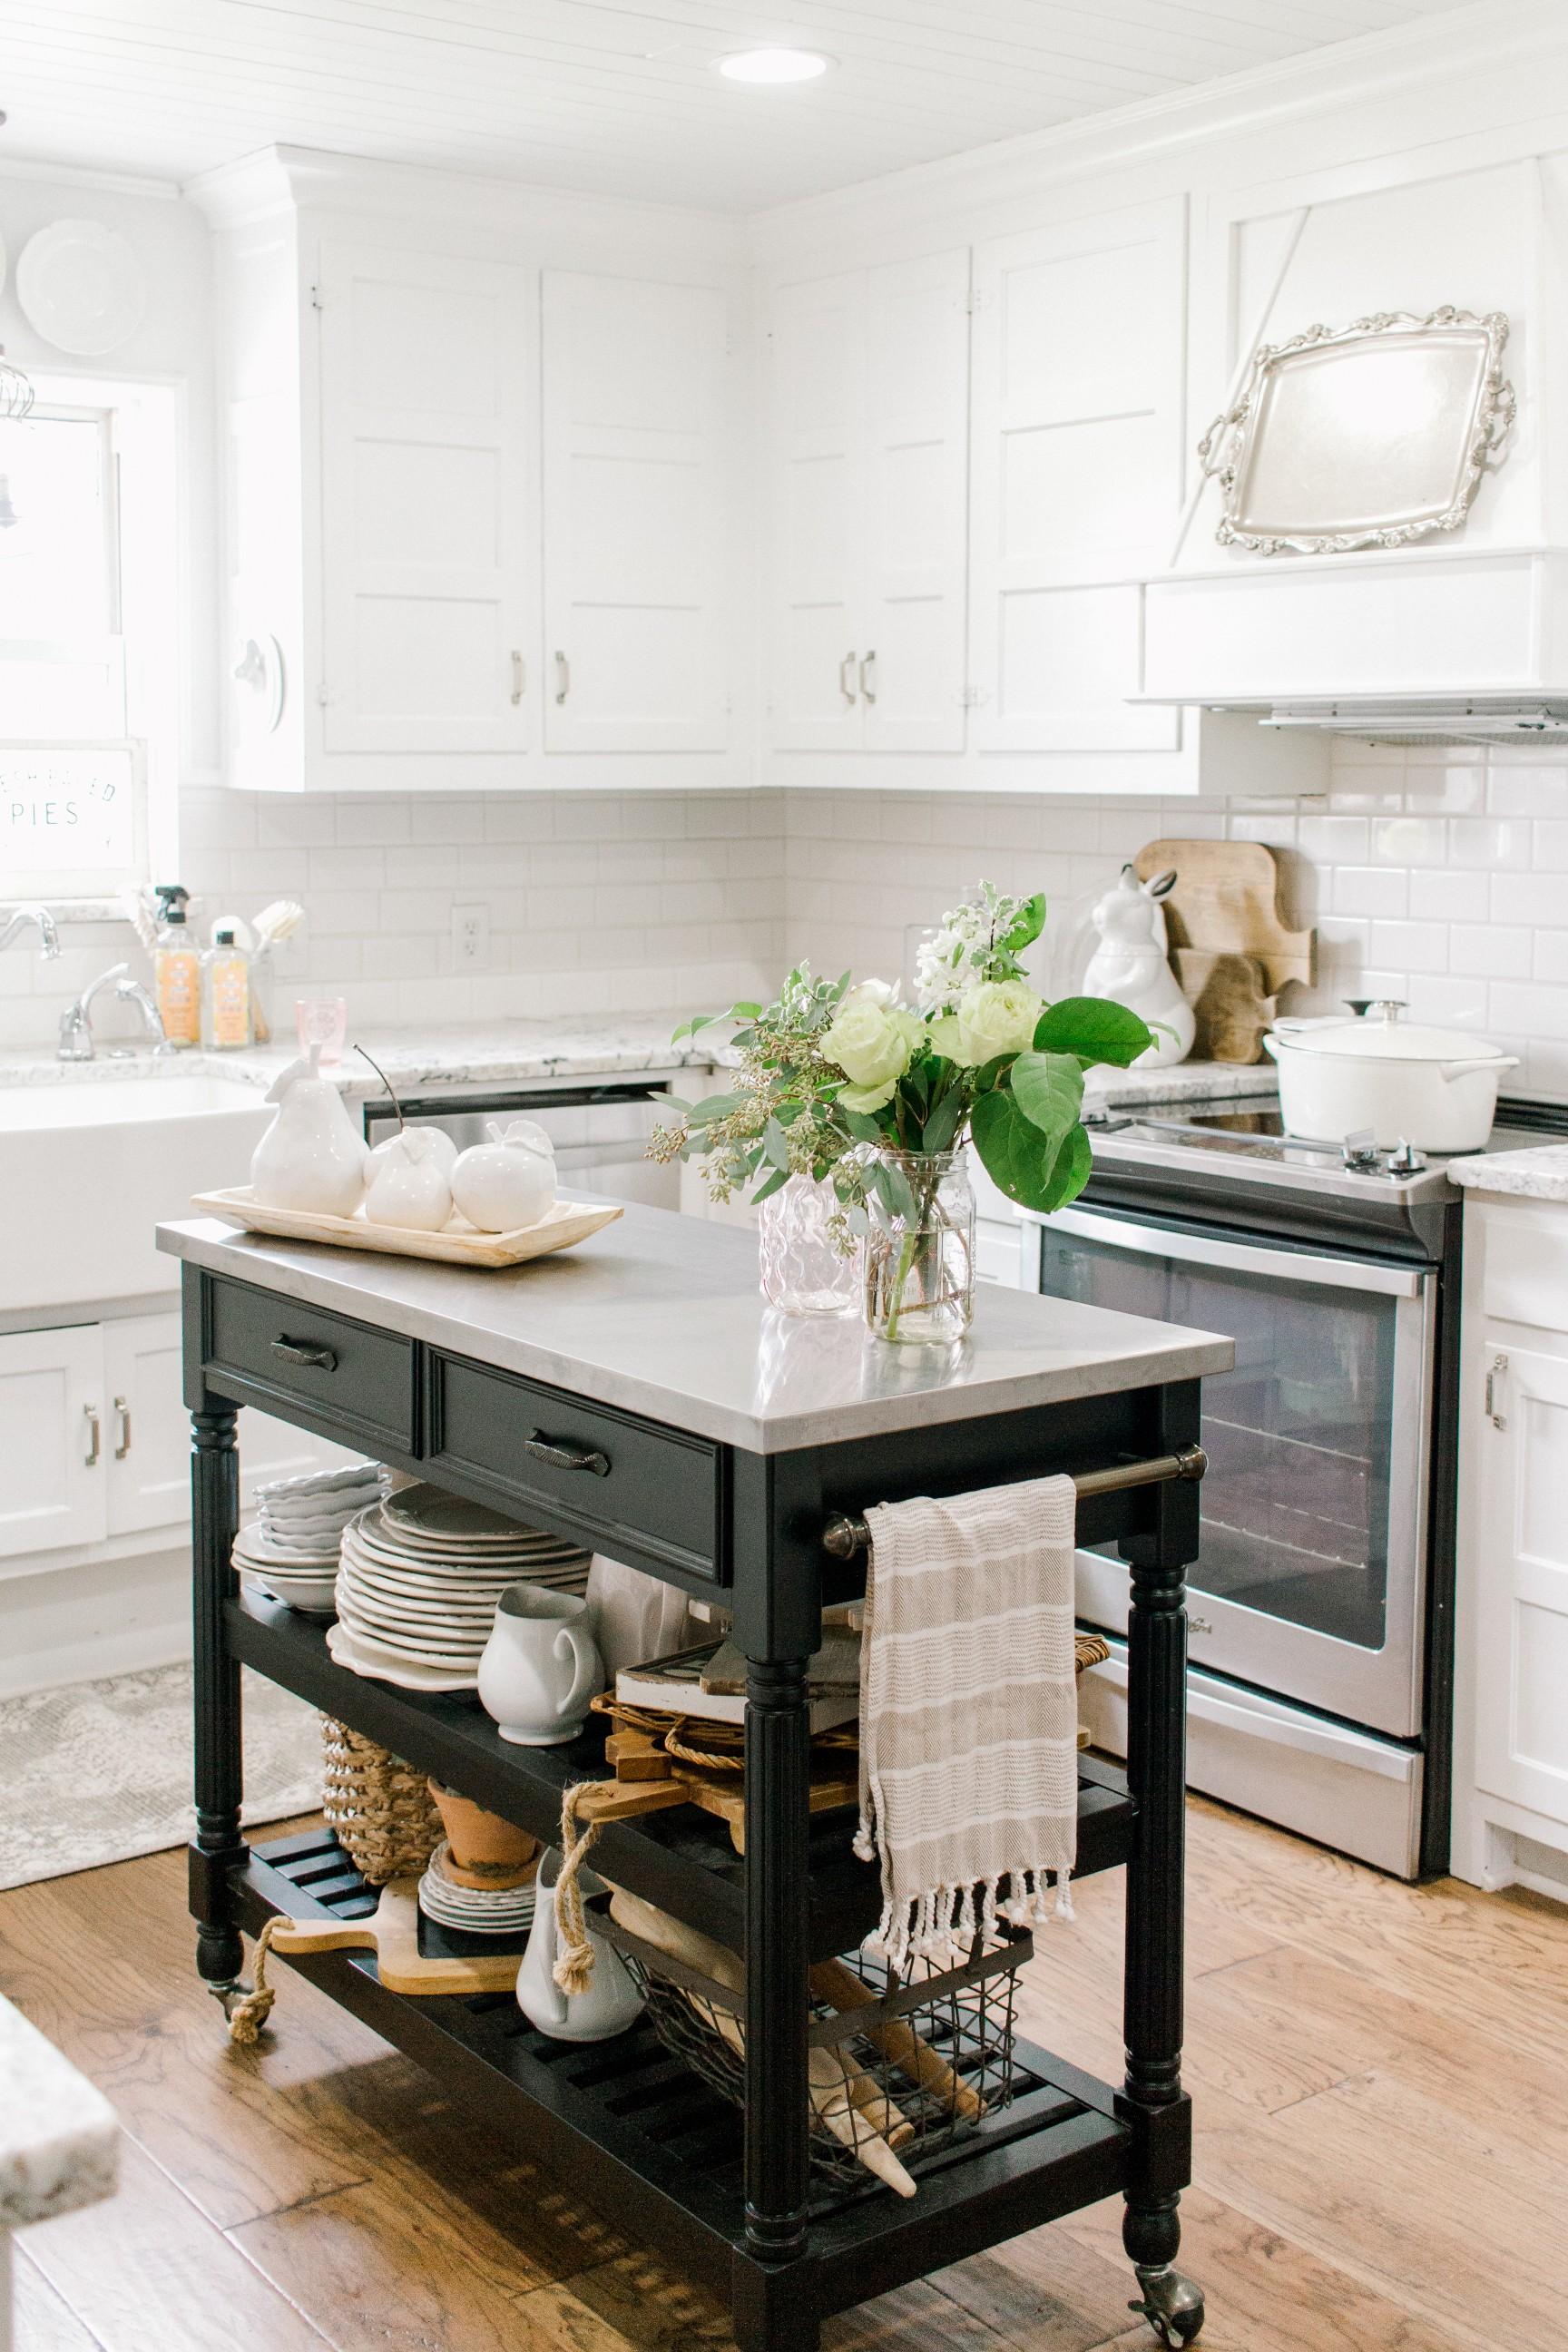 My Little White Barn Home Tour  - Spring Decor Inspiration - Kitchen